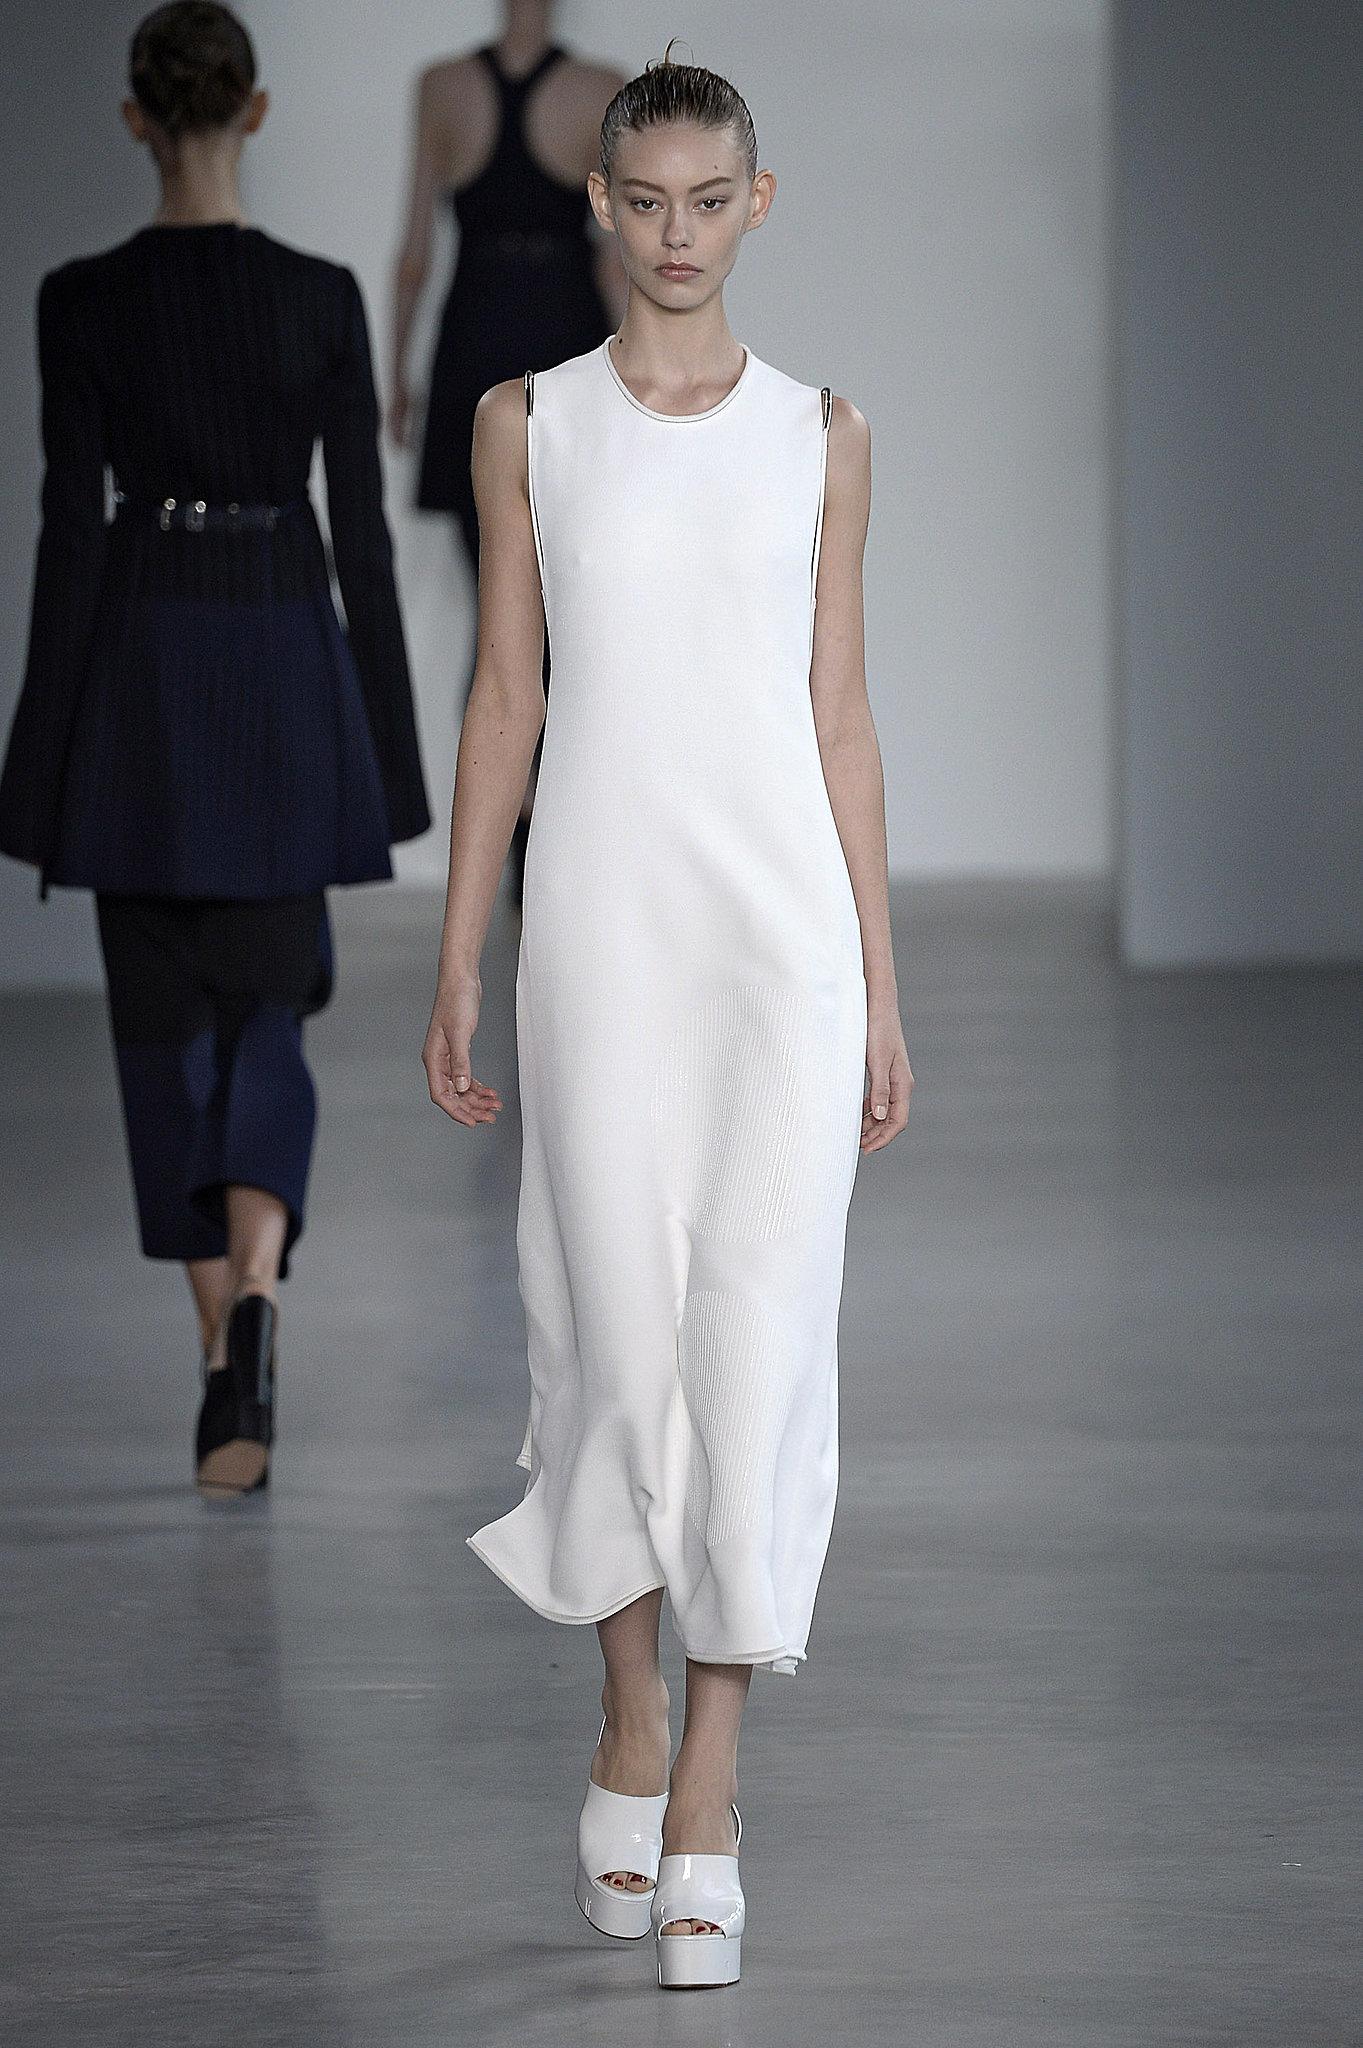 New York Fashion Week Spring Summer 2015 Street Style 10